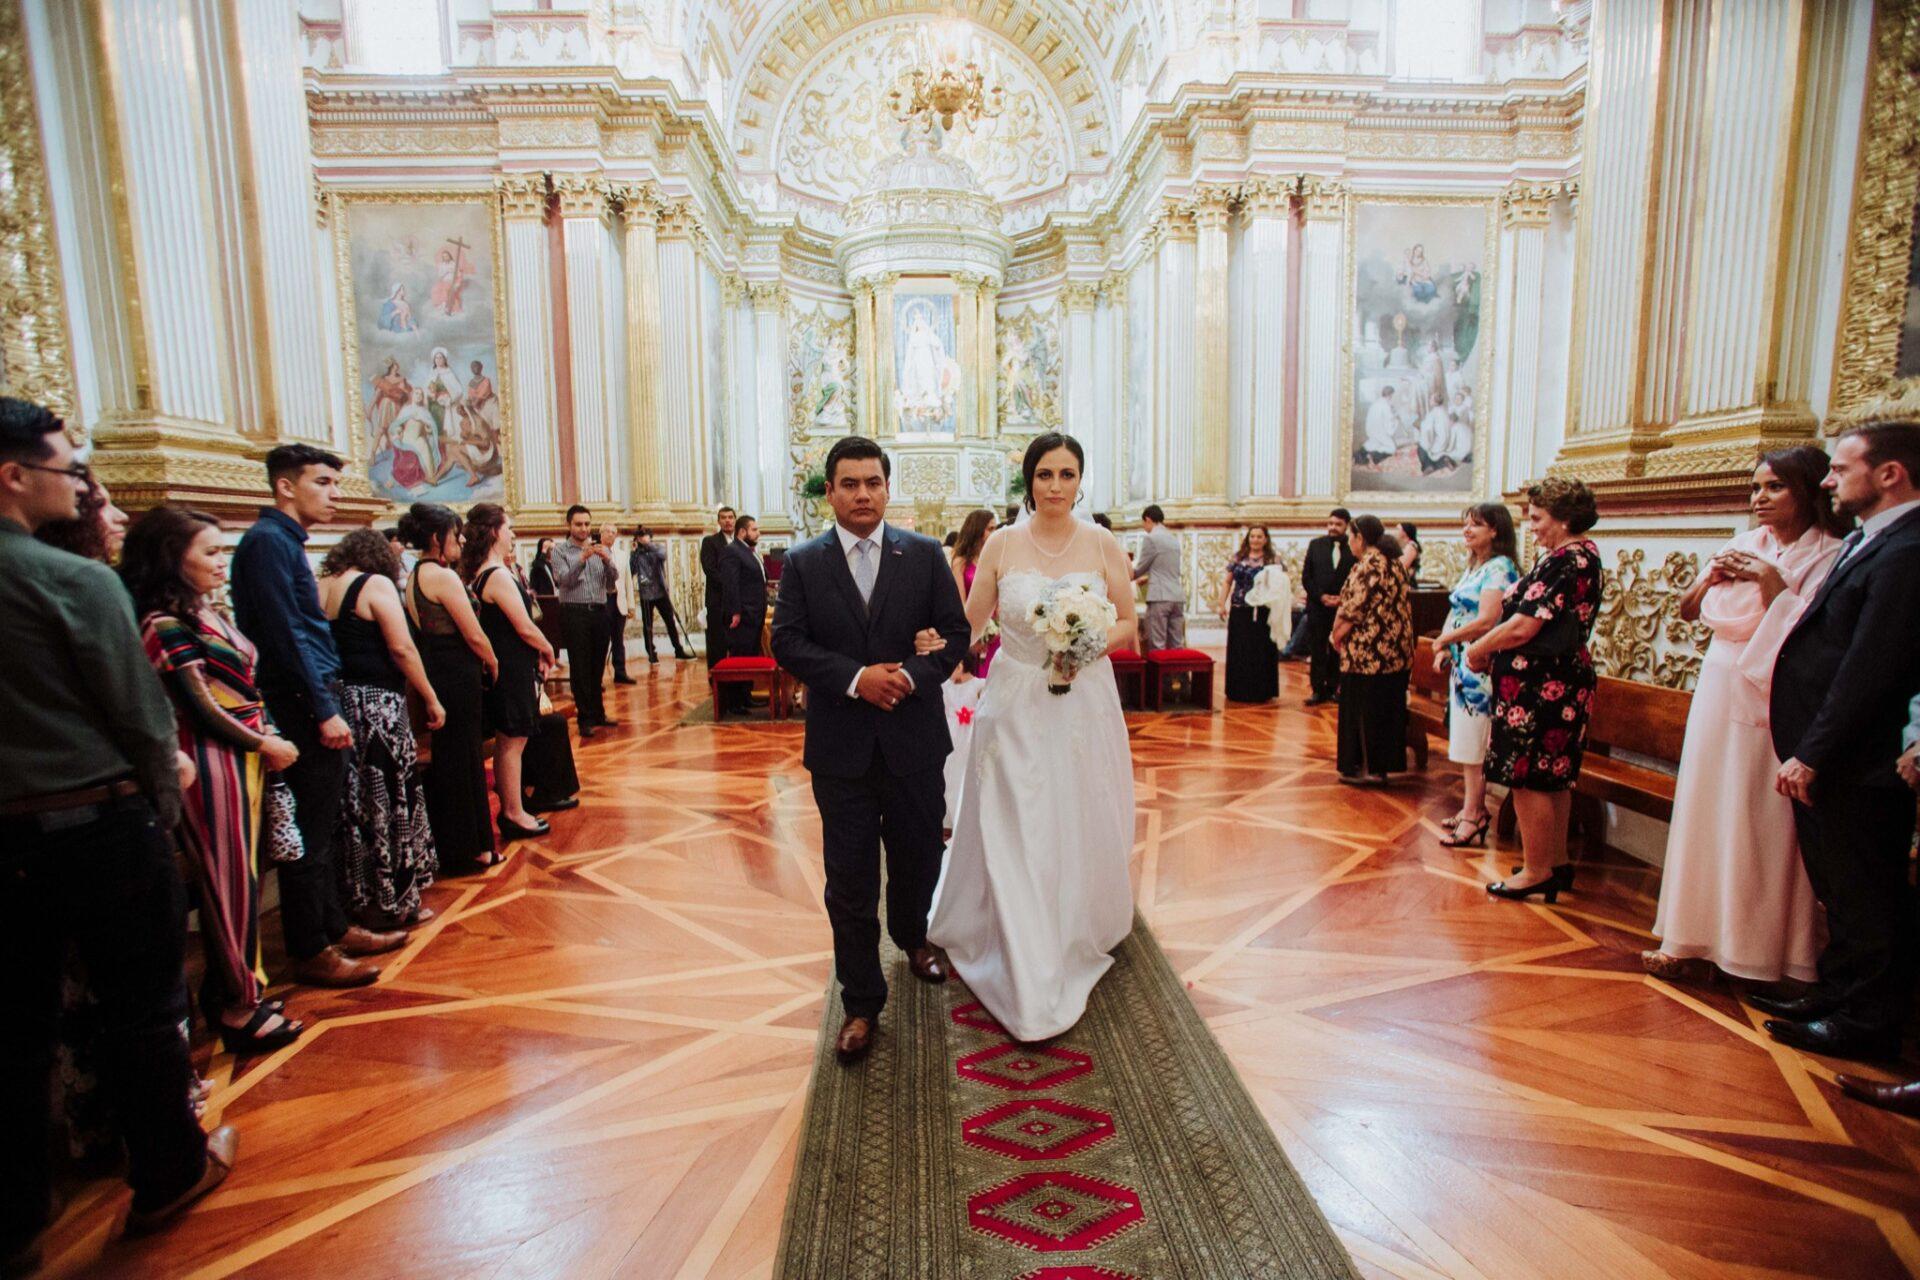 javier_noriega_fotografo_bodas_centro_platero_zacatecas_wedding_photographer16